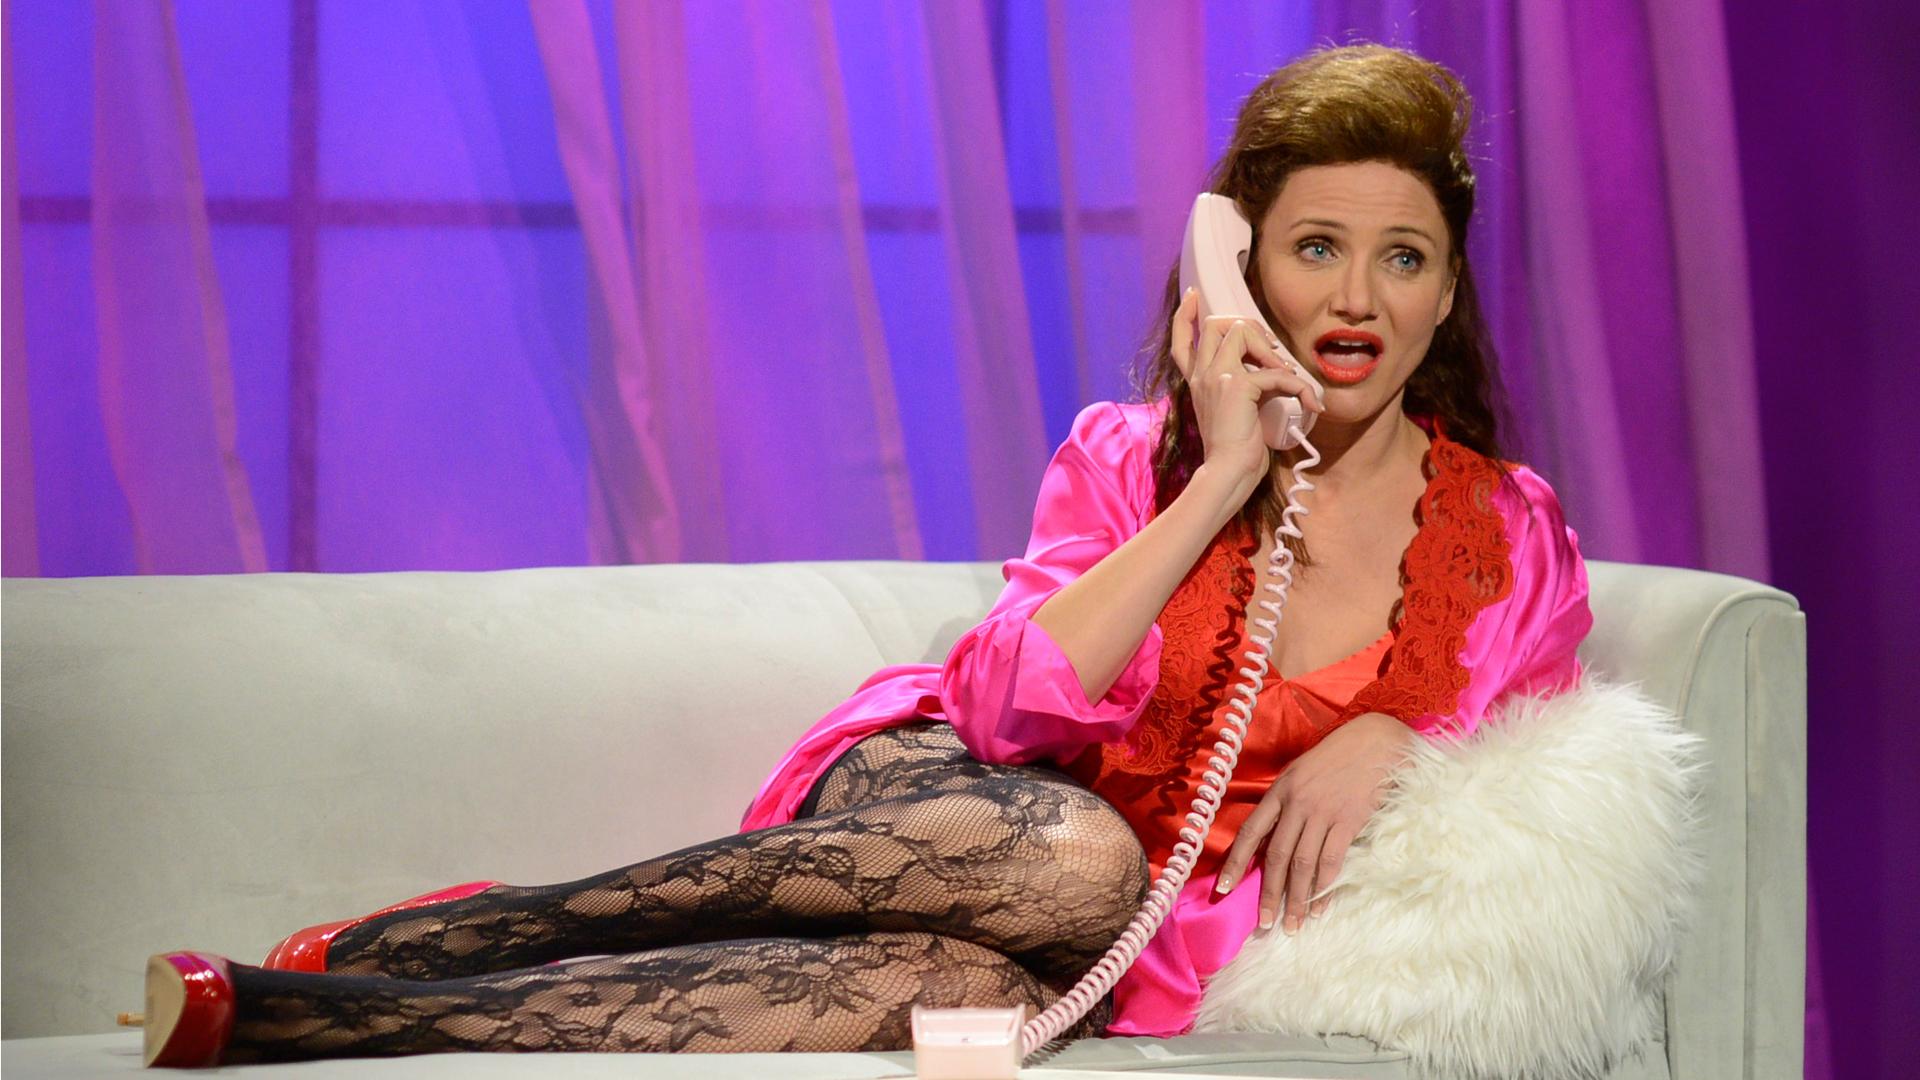 Watch Night Murmurs From Saturday Night Live